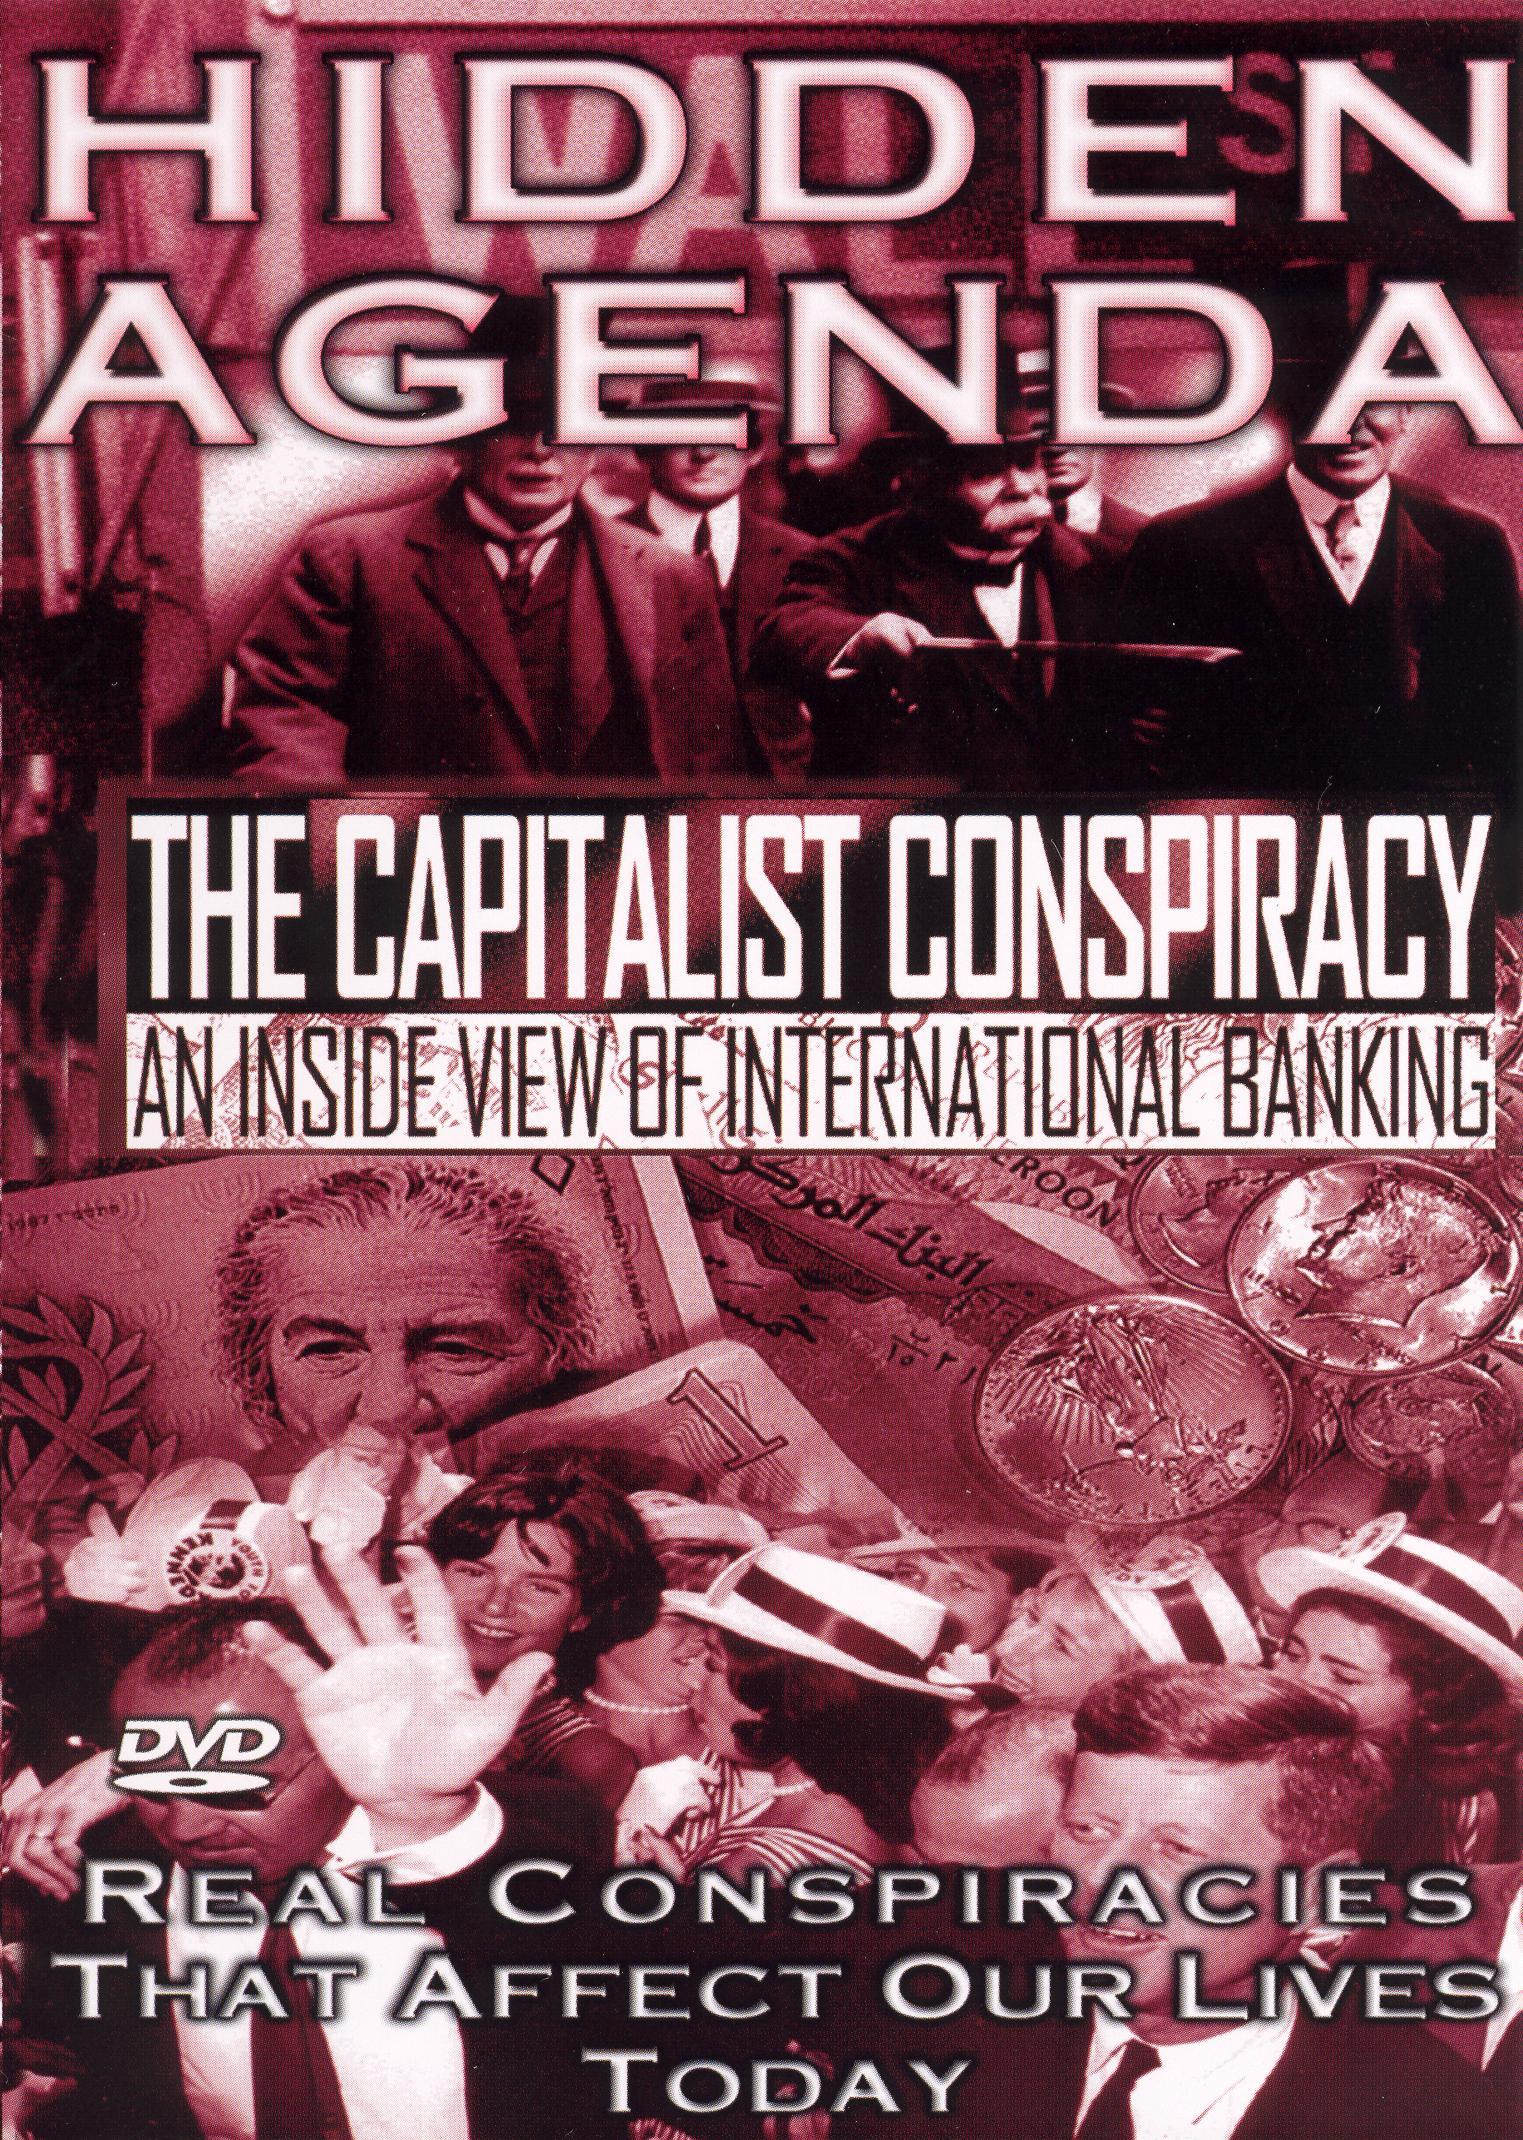 Hidden Agenda, Vol. 1: The Capitalist Conspiracy